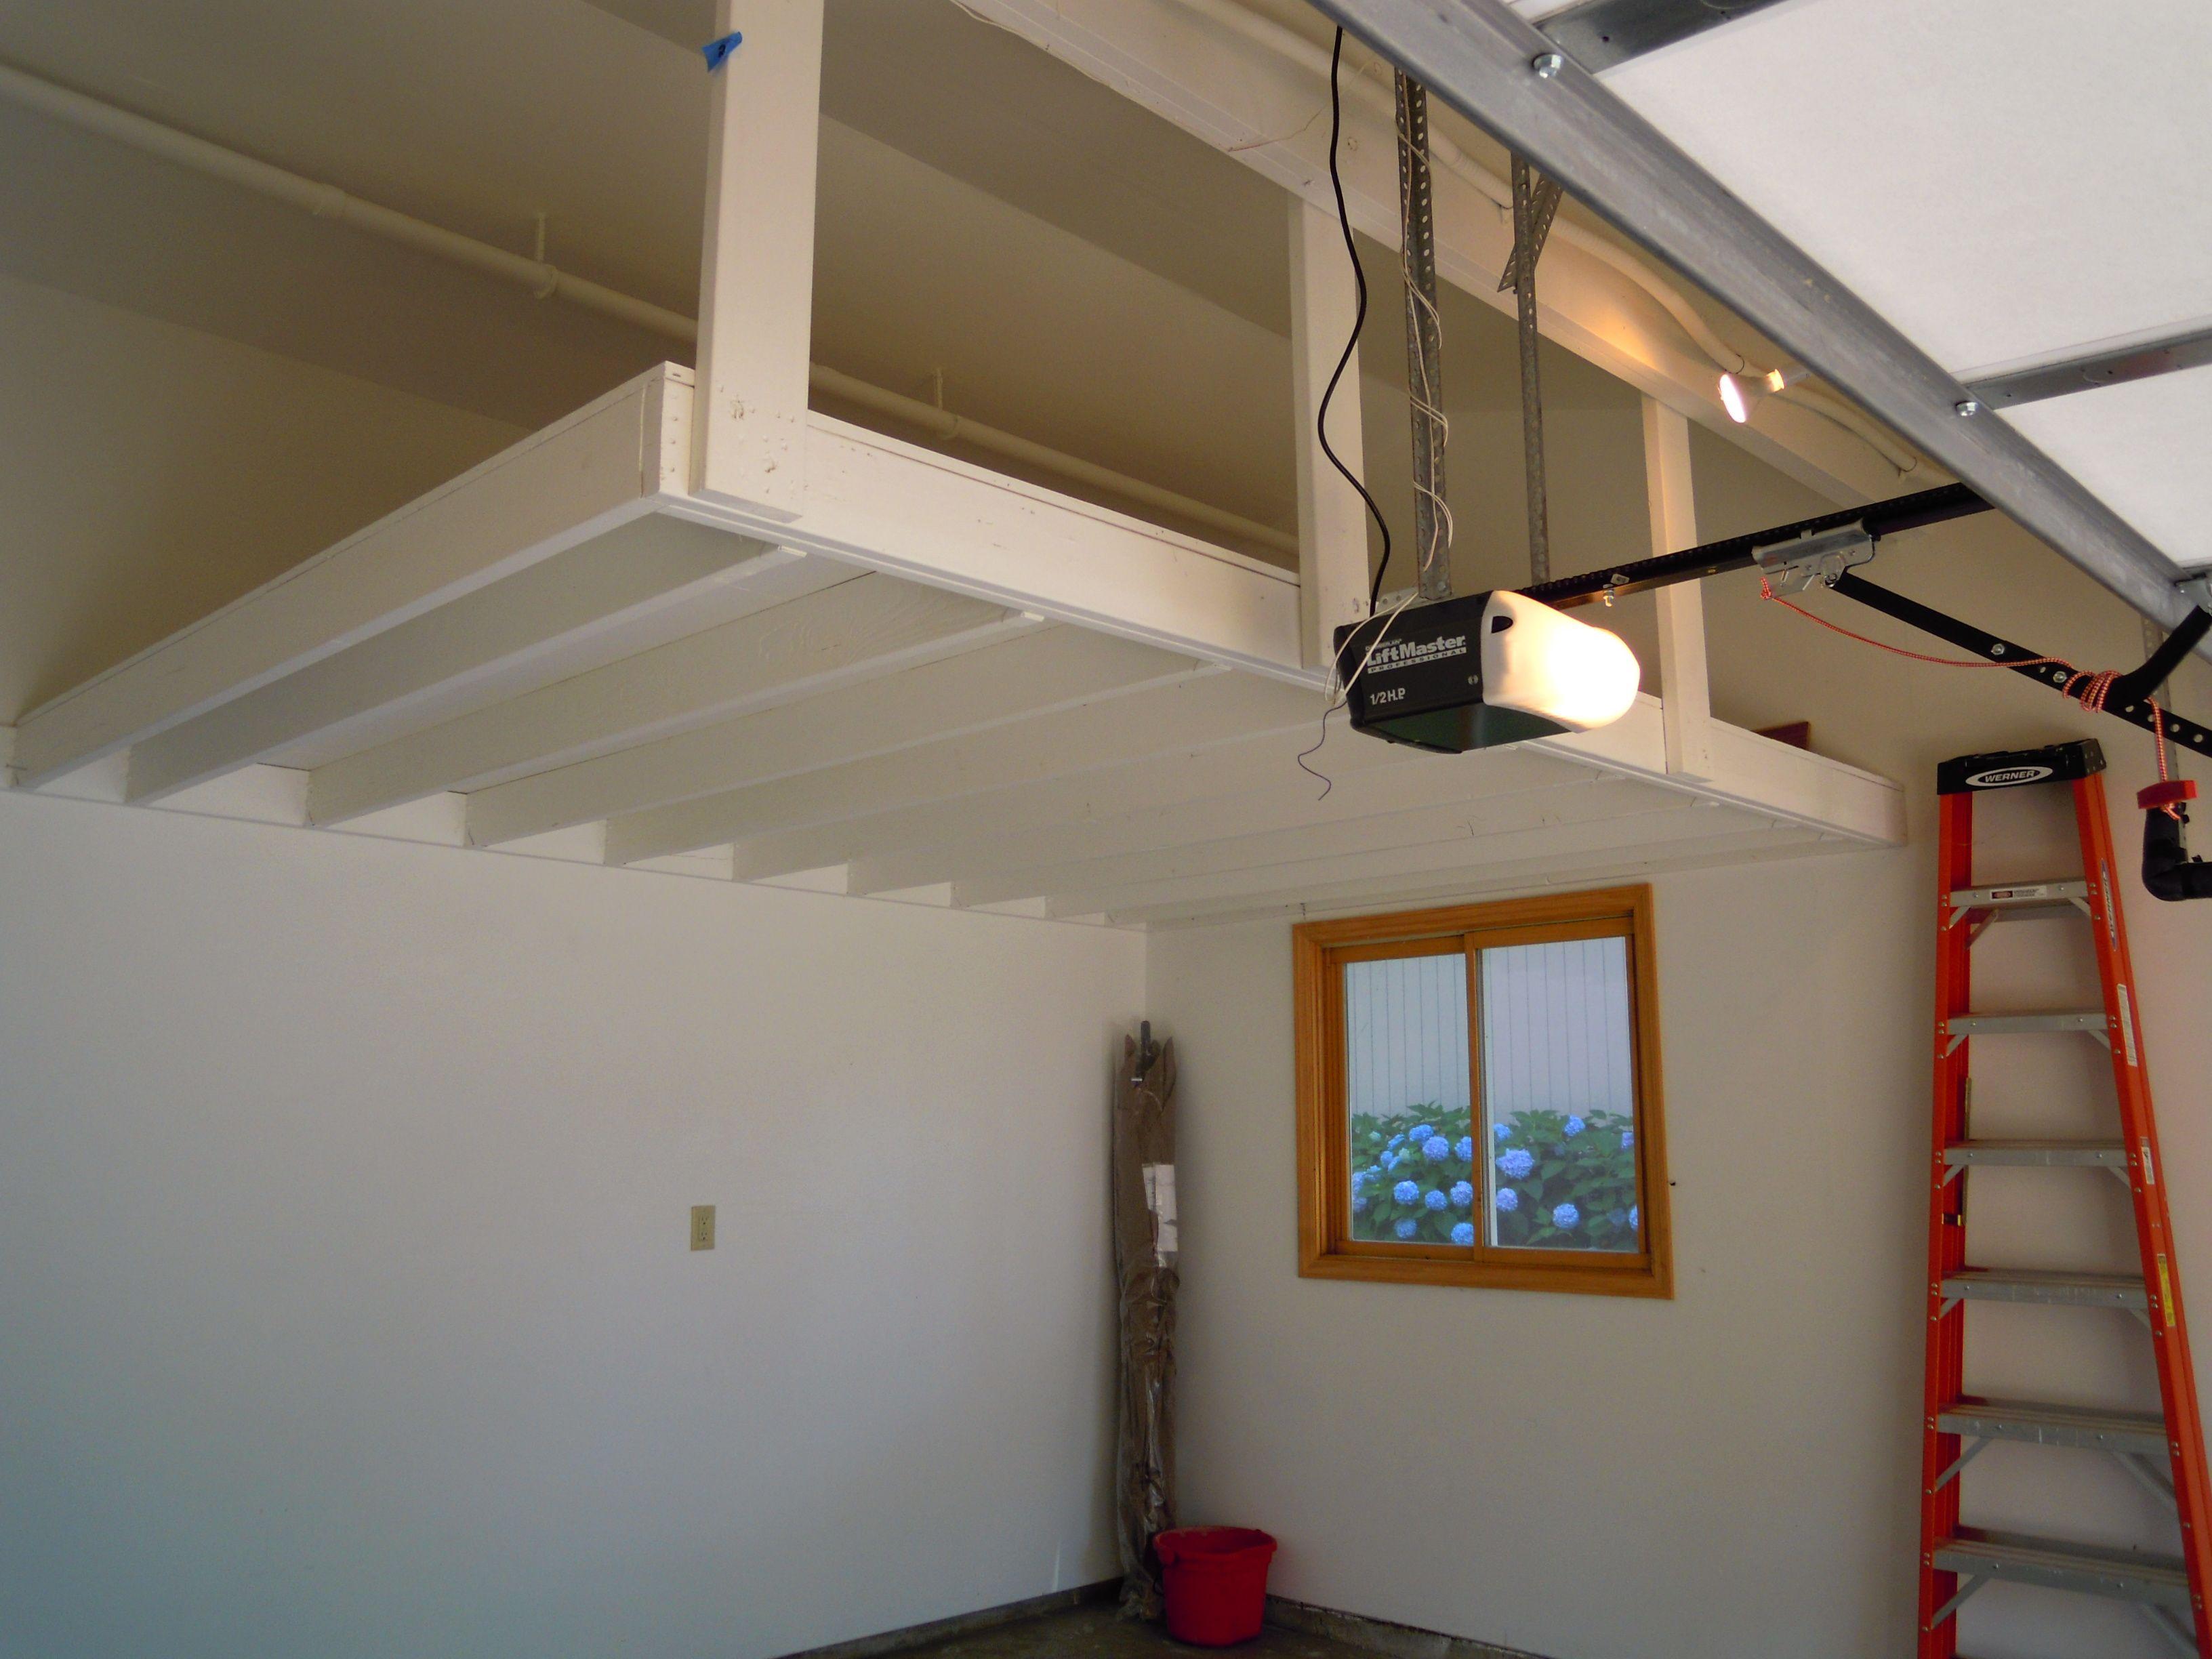 Overhead Garage Storage Awesome